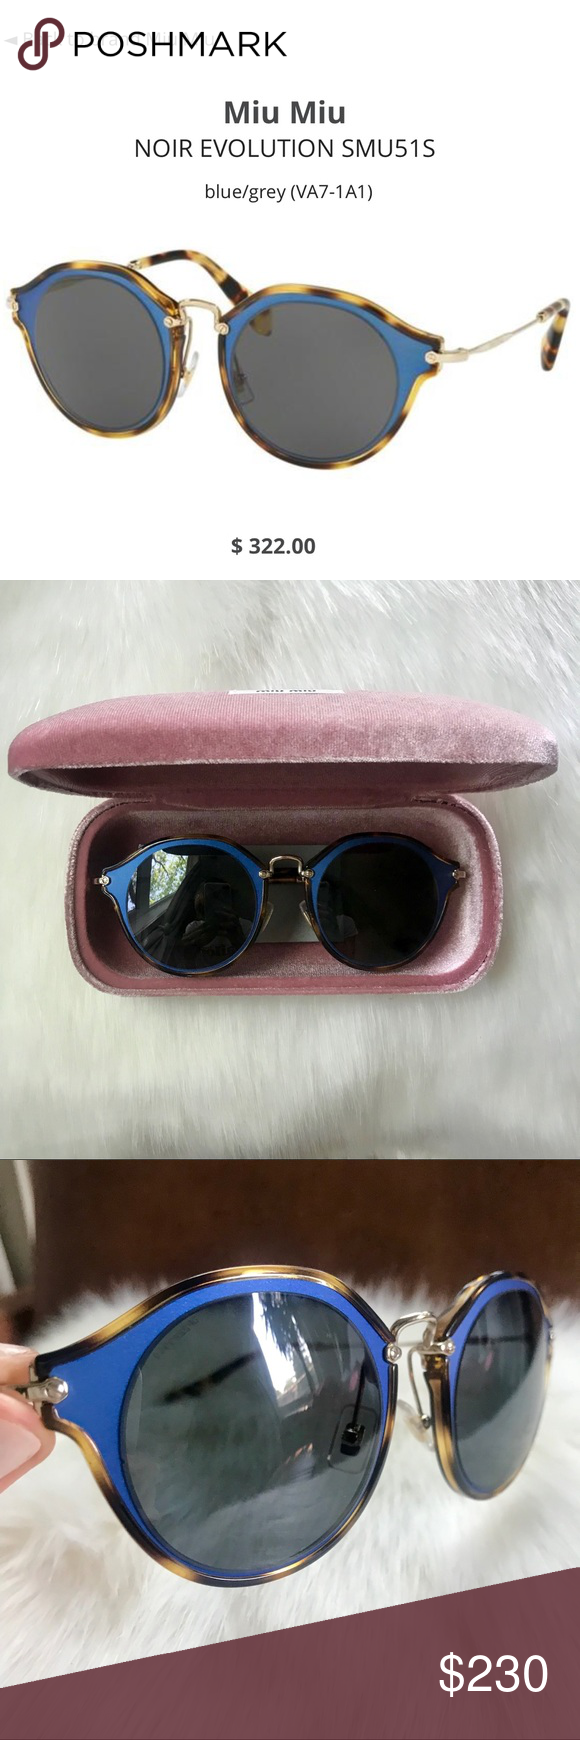 4c59d0890132 Miu Miu Noir Evolution Sunglasses Beautiful sunnies by Miu Miu (Prada s  cooler more hip sister). In excellent condition - no scratches. Comes with  case.